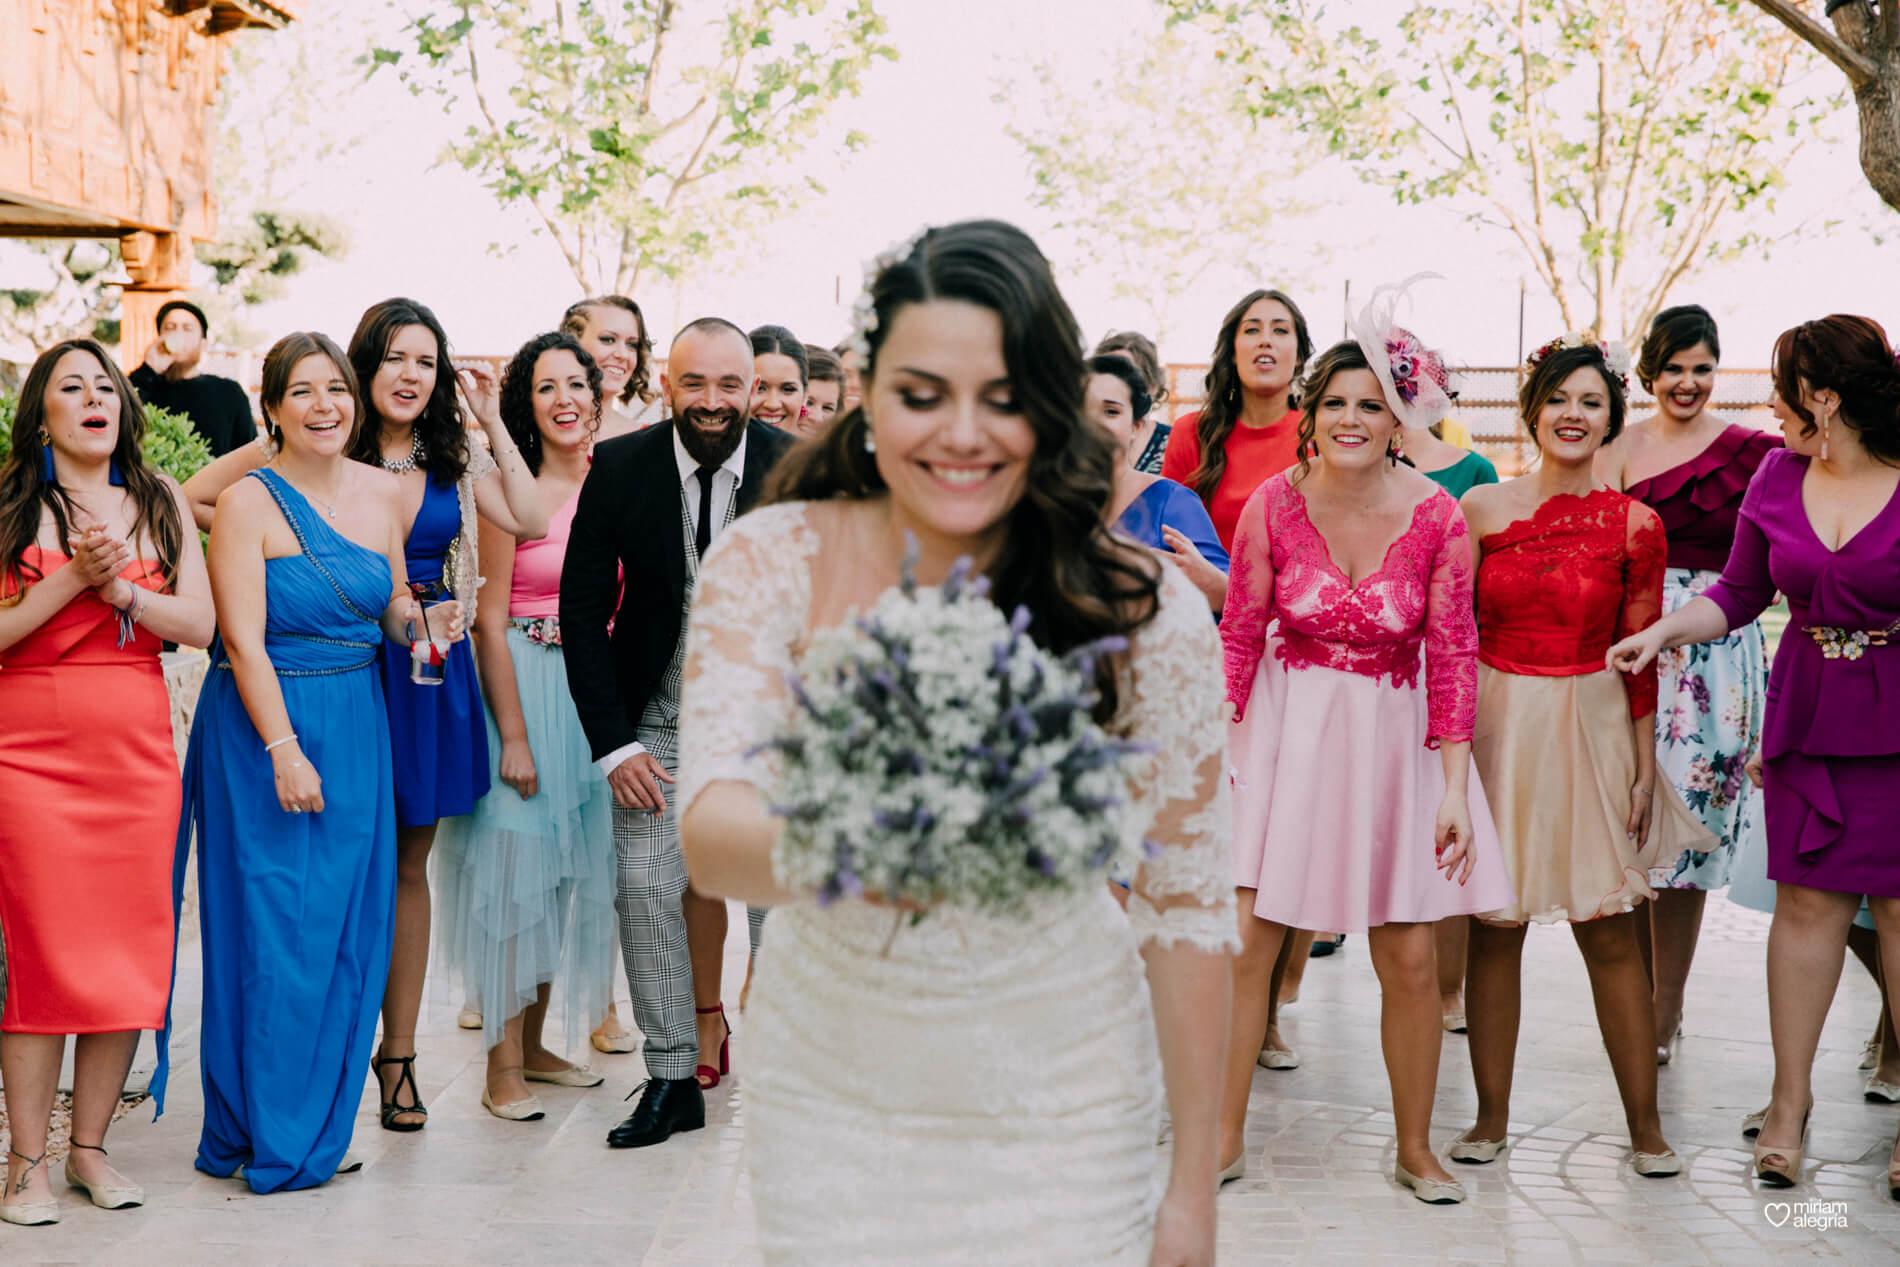 boda-en-finca-jurosa-miriam-alegria-135